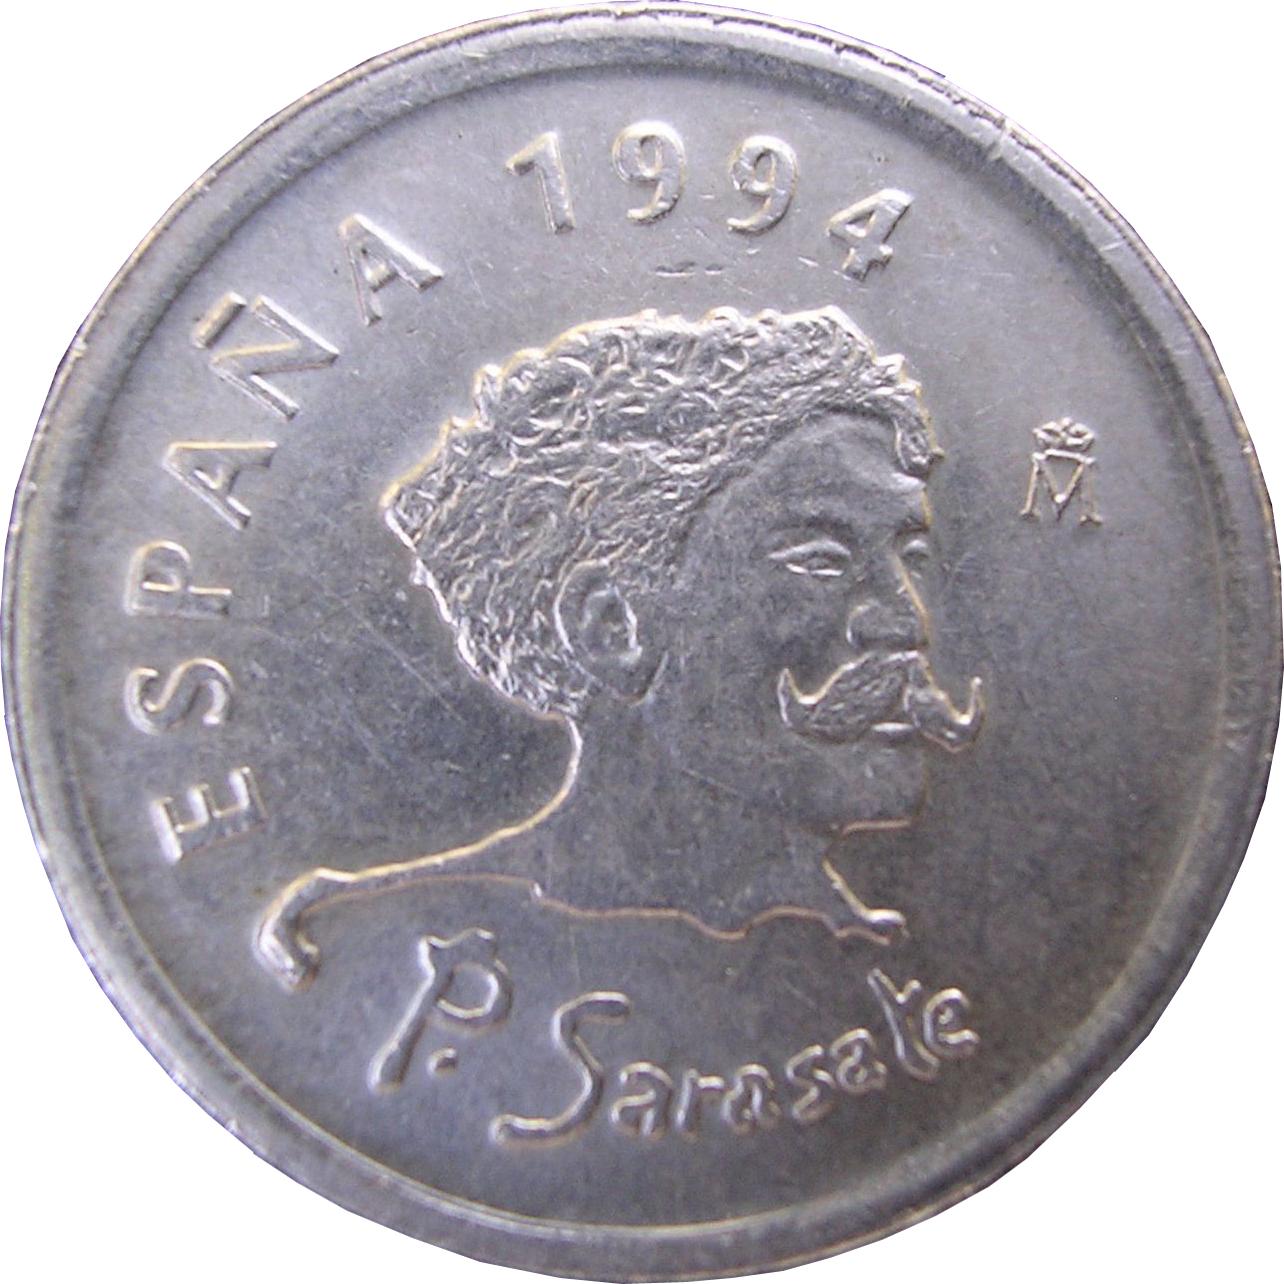 1994 Spain 10 Peseta Coin Honors Sarasate